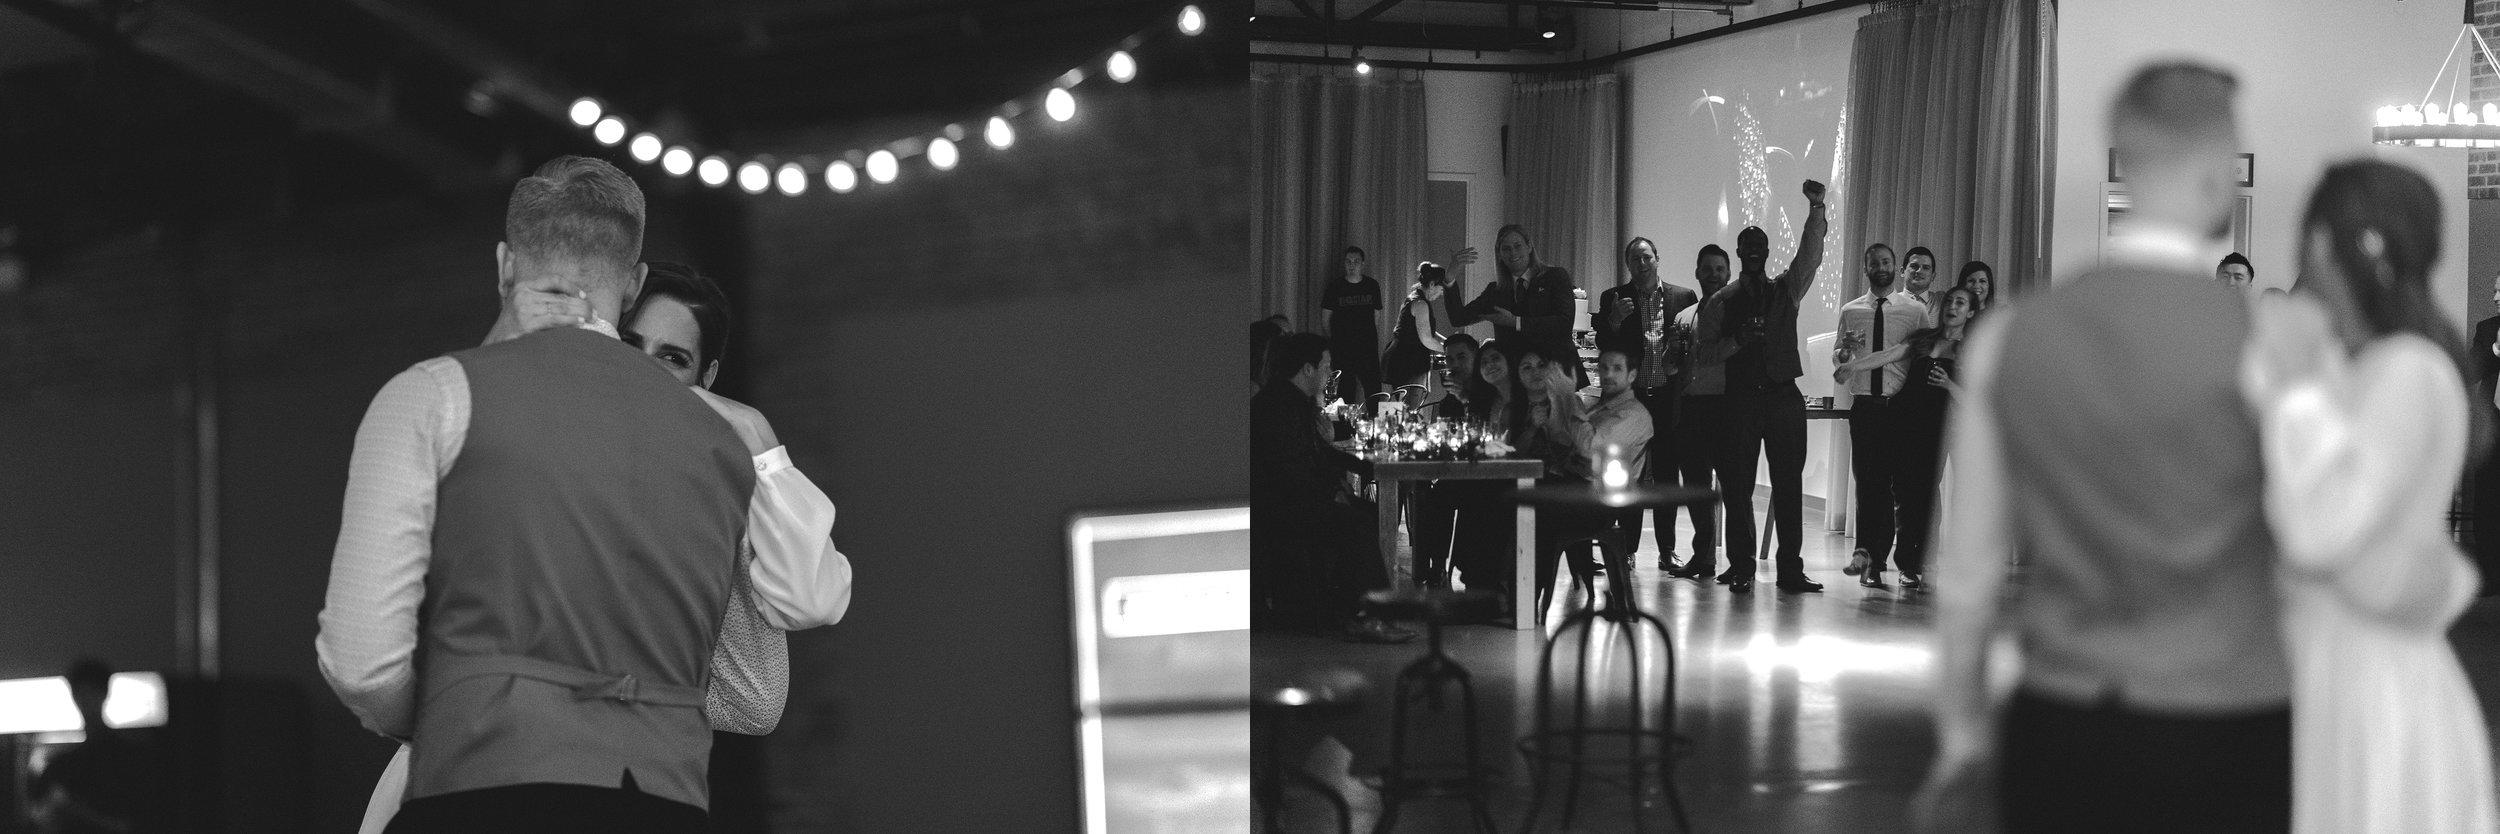 chicago_wedding_photography_zoe_rain_40.jpg